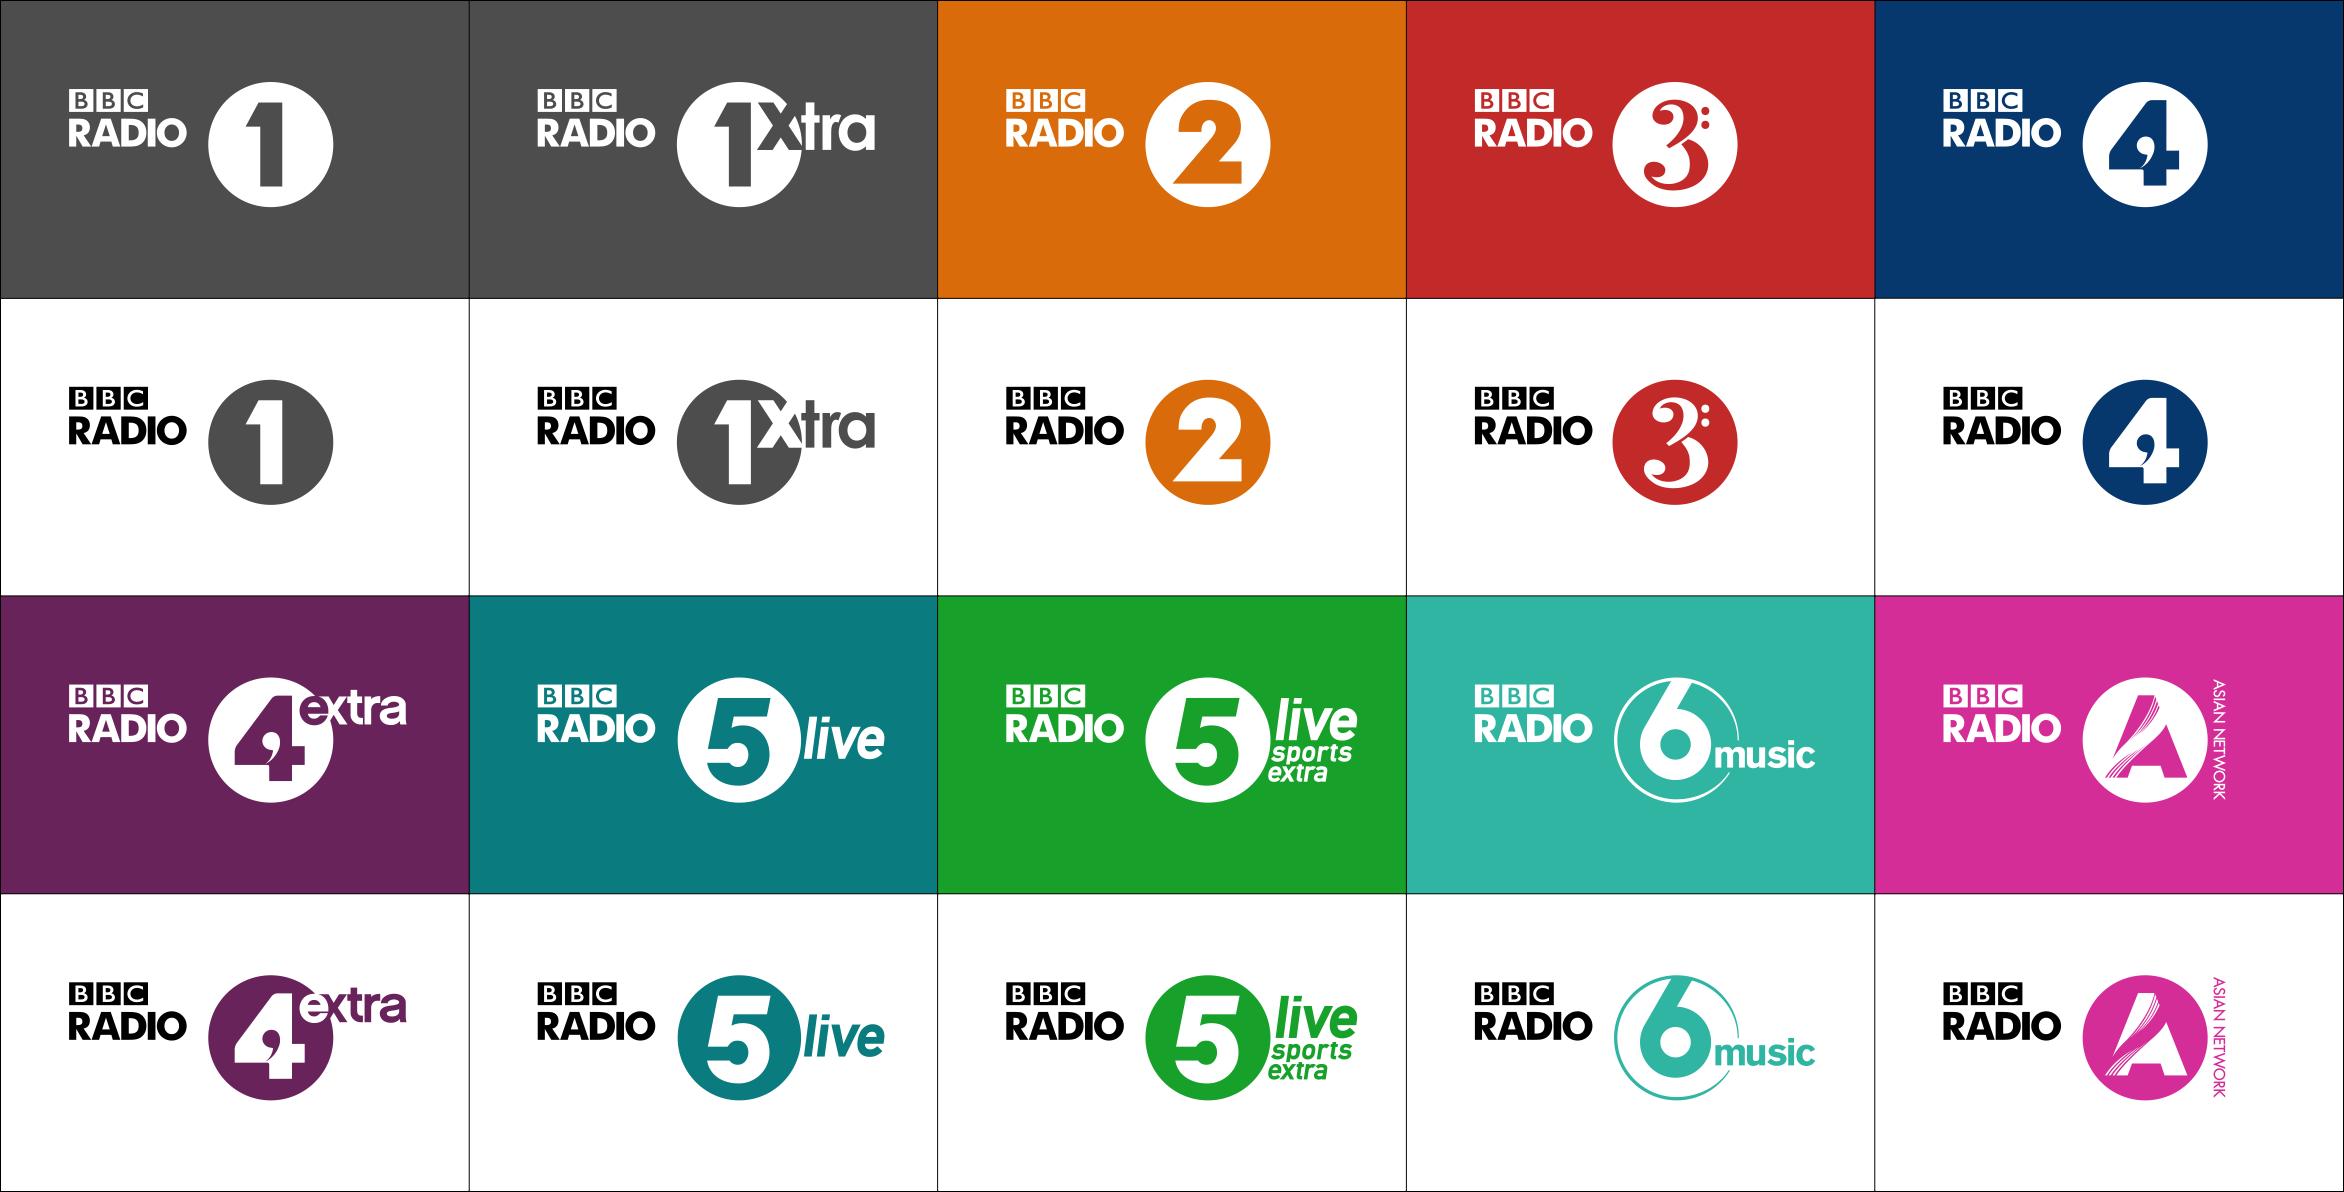 Total BBC Refresh V2 Radio 2.png 2.344×1.192 pixels